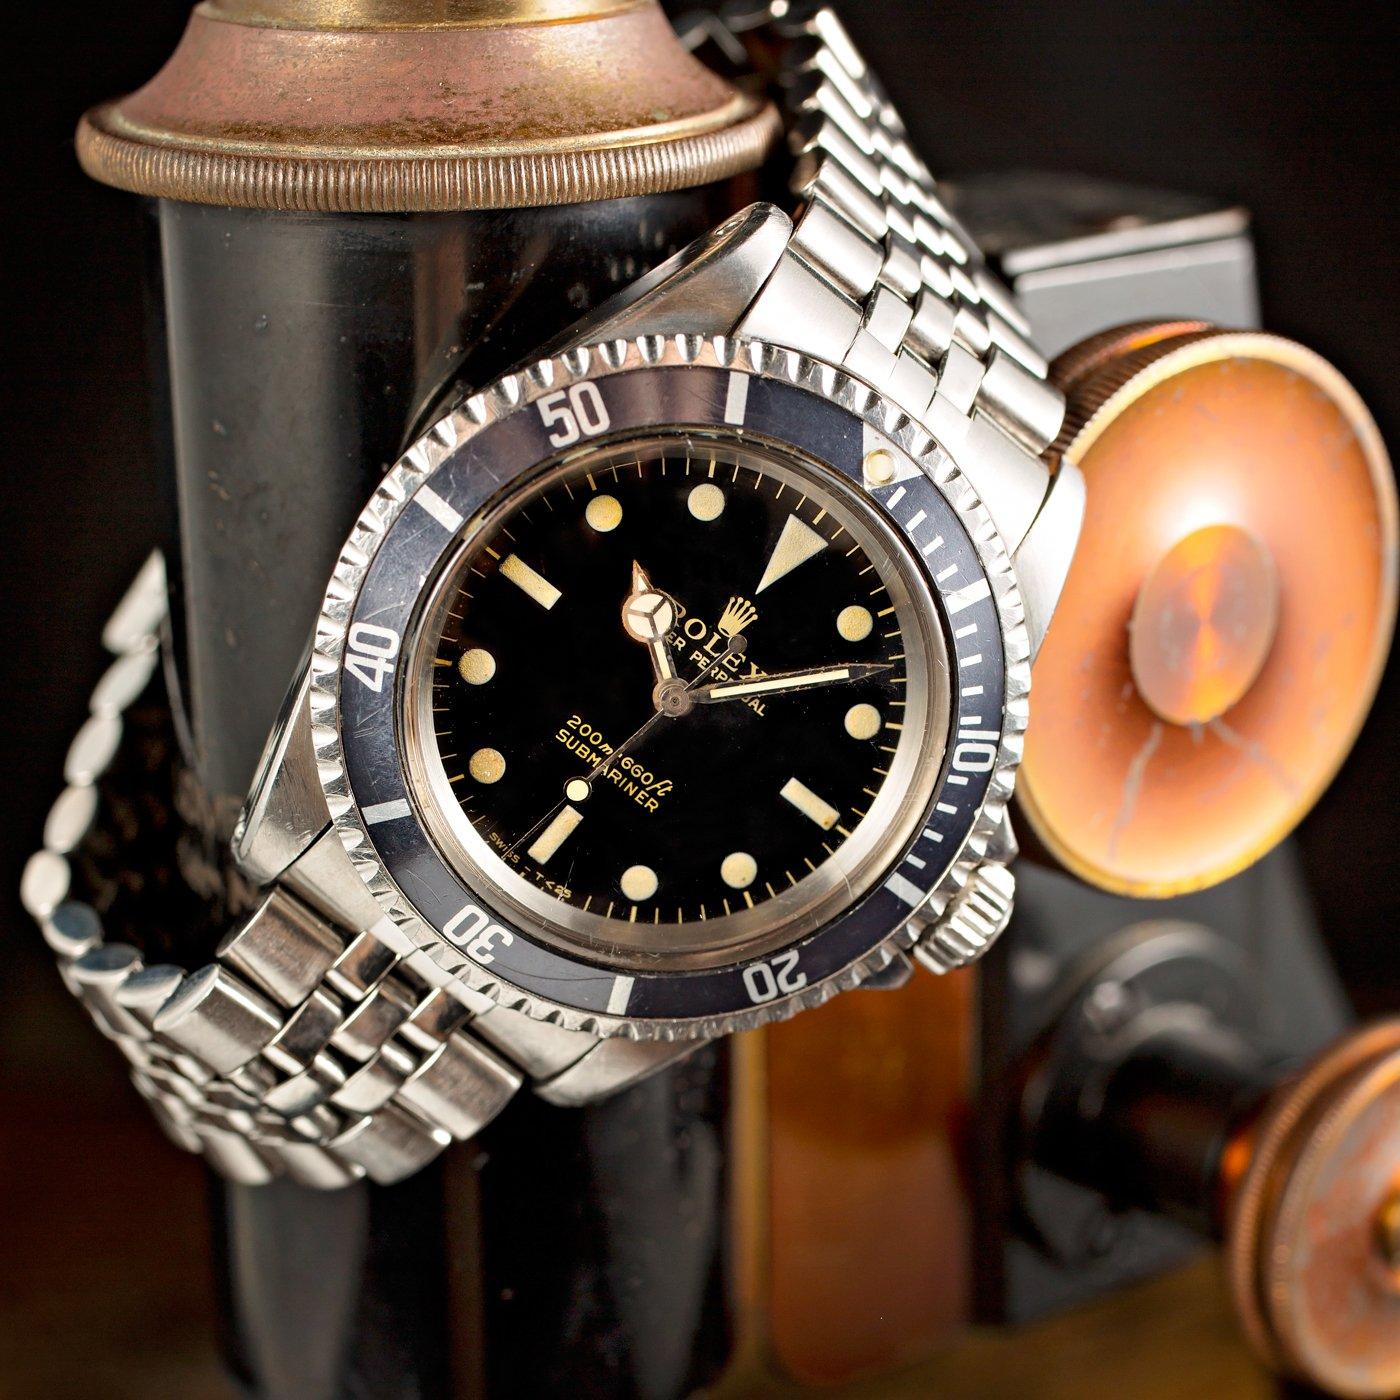 Vintage Rolex Submariner Black Dial